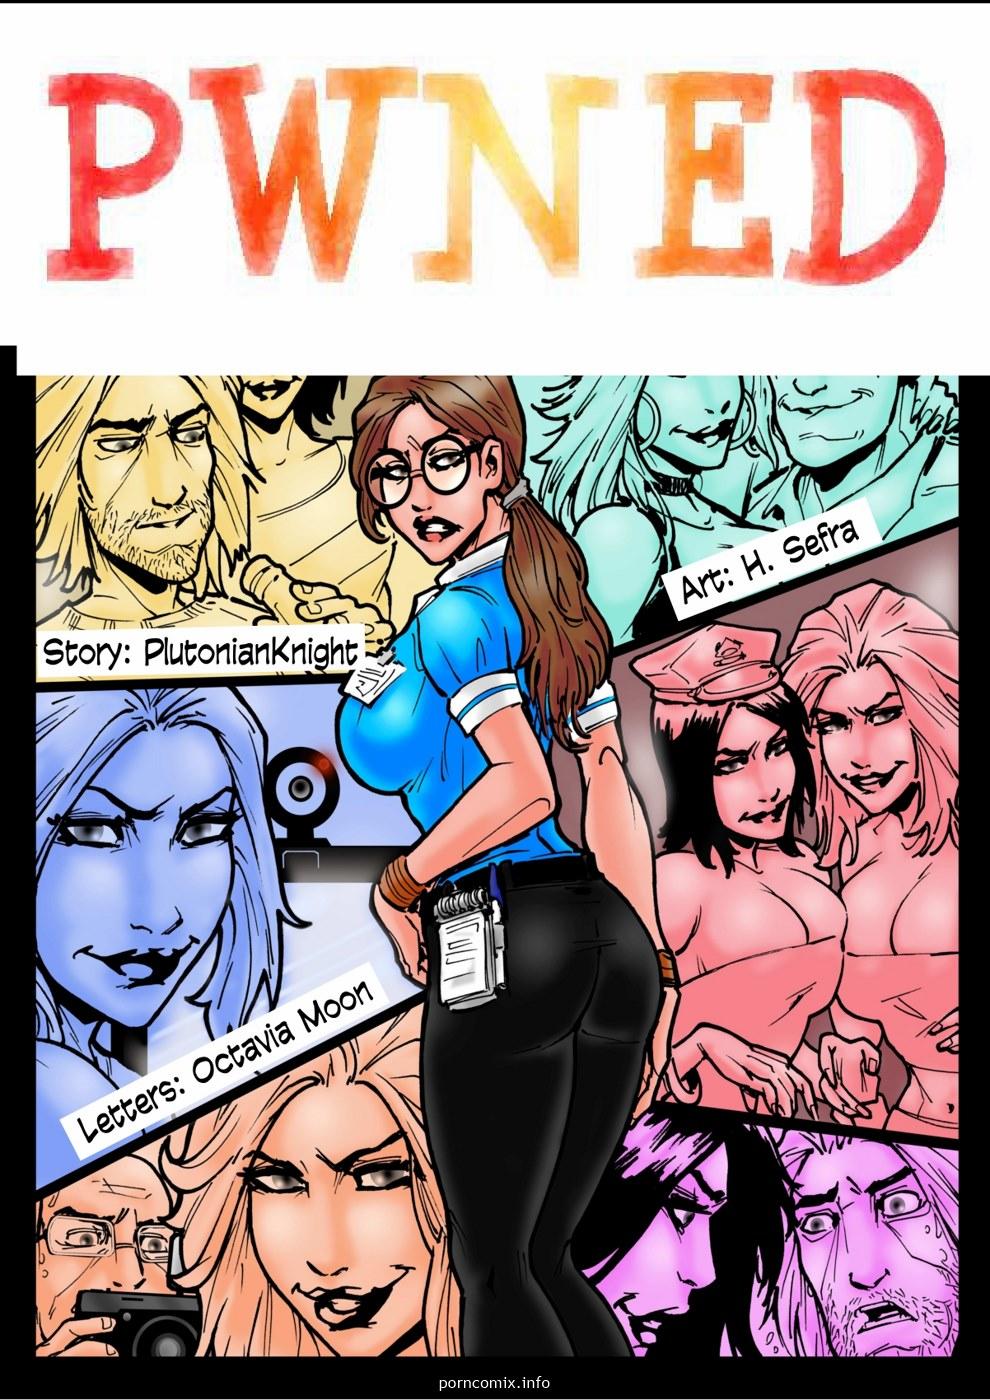 Porn Comics - Pwned- MCC, Mindcontrol porn comics 8 muses